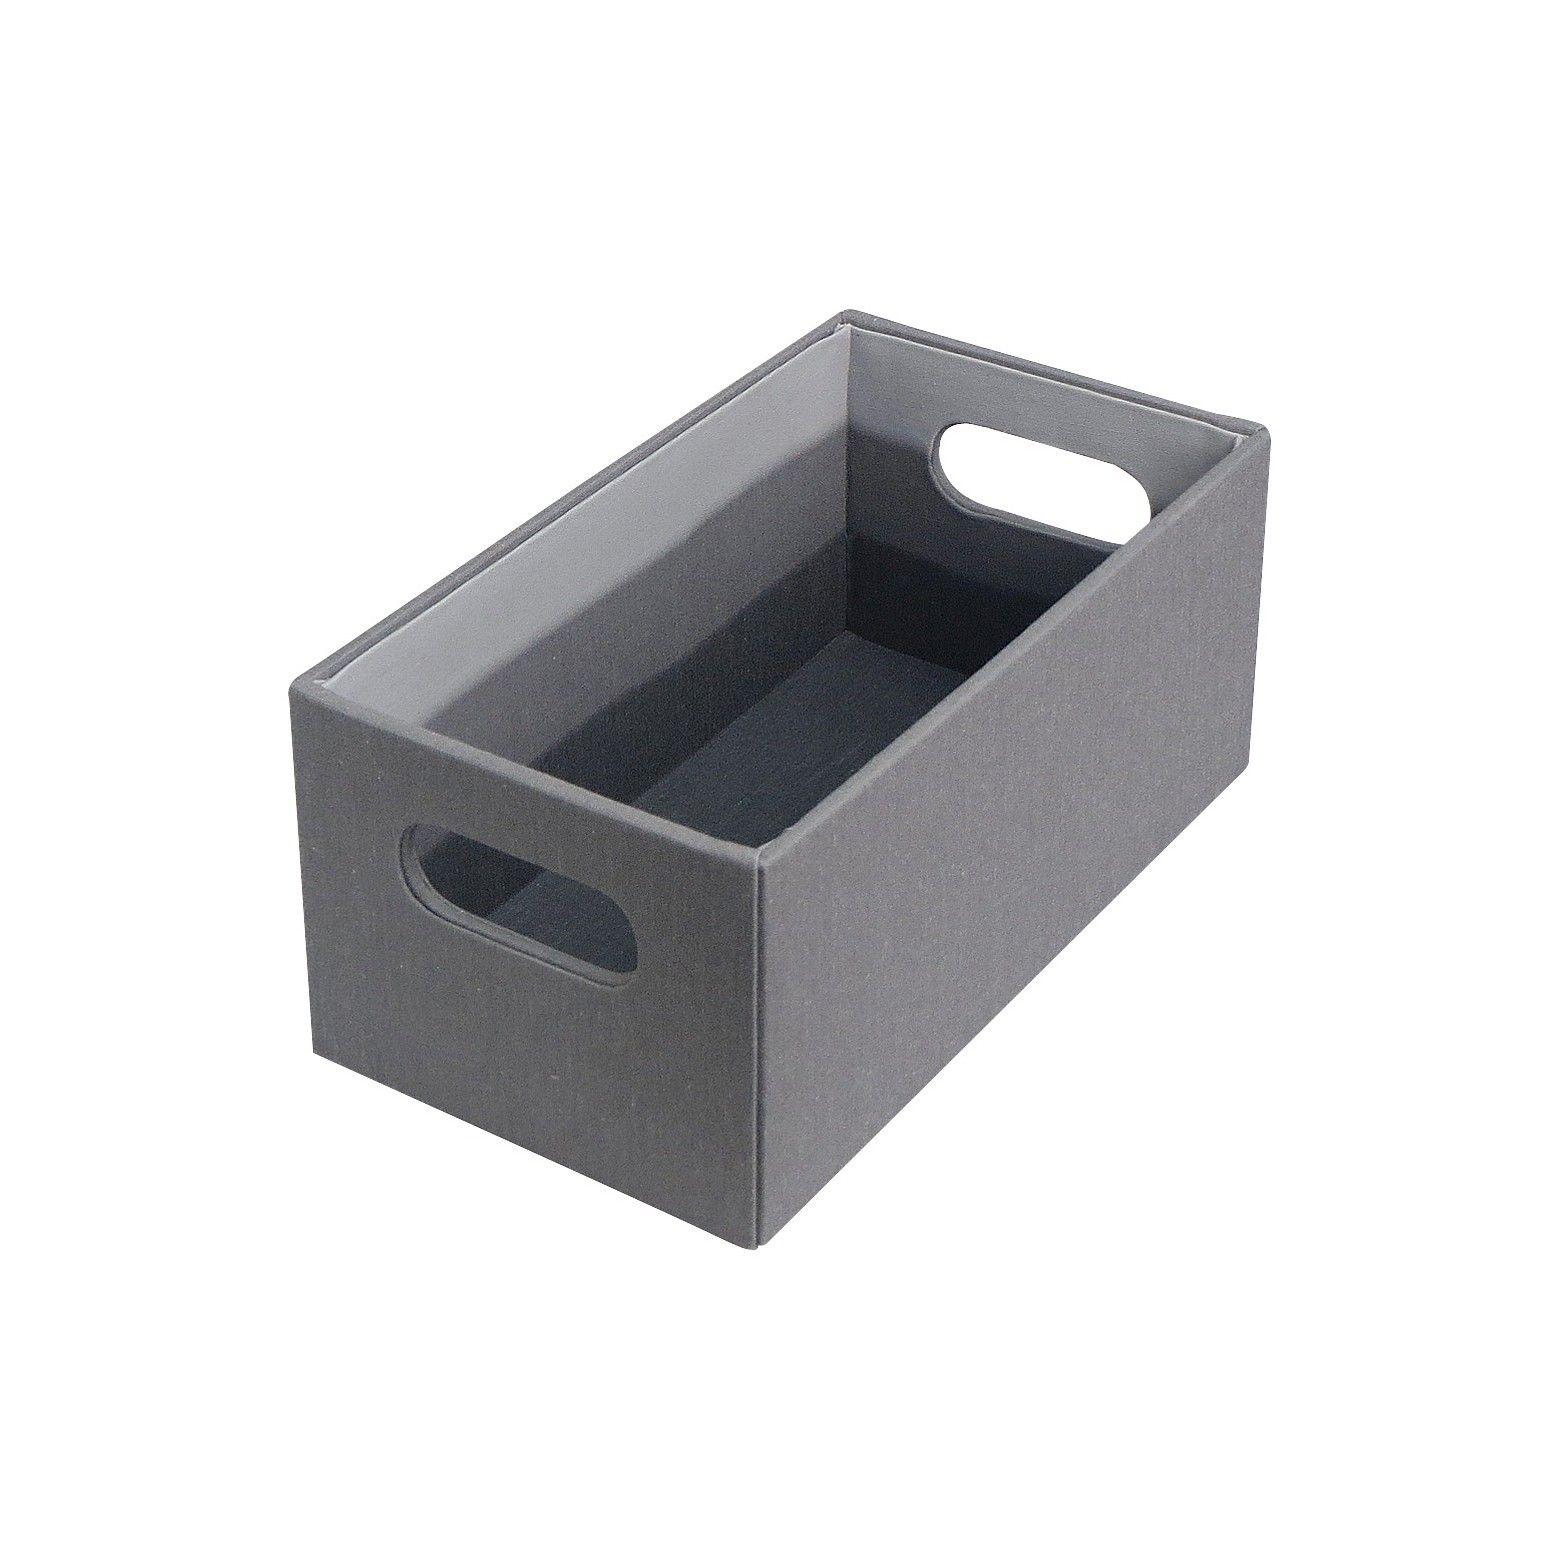 CD/DVD Storage Box - Grey - Room Essentialsu0026#153;  sc 1 st  Pinterest & CD/DVD Storage Box - Grey - Room Essentialsu0026#153; | Room By Room ...